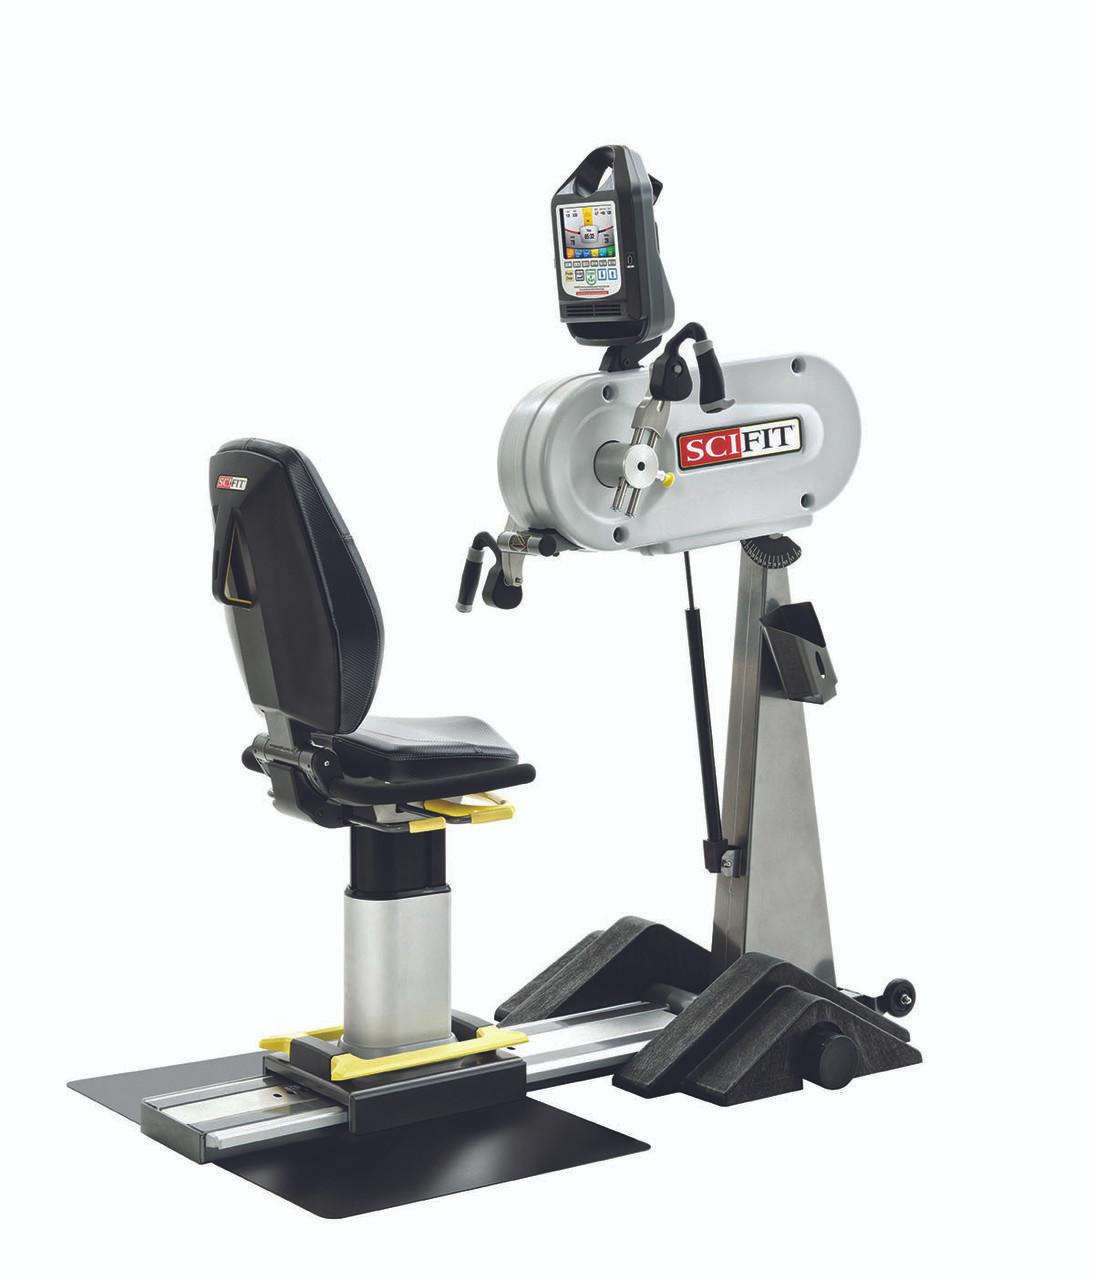 SciFit PRO1 Upper Body Exerciser - Adjustable Tilt Head & Cranks - Premium Seat - Wheelchair Platform